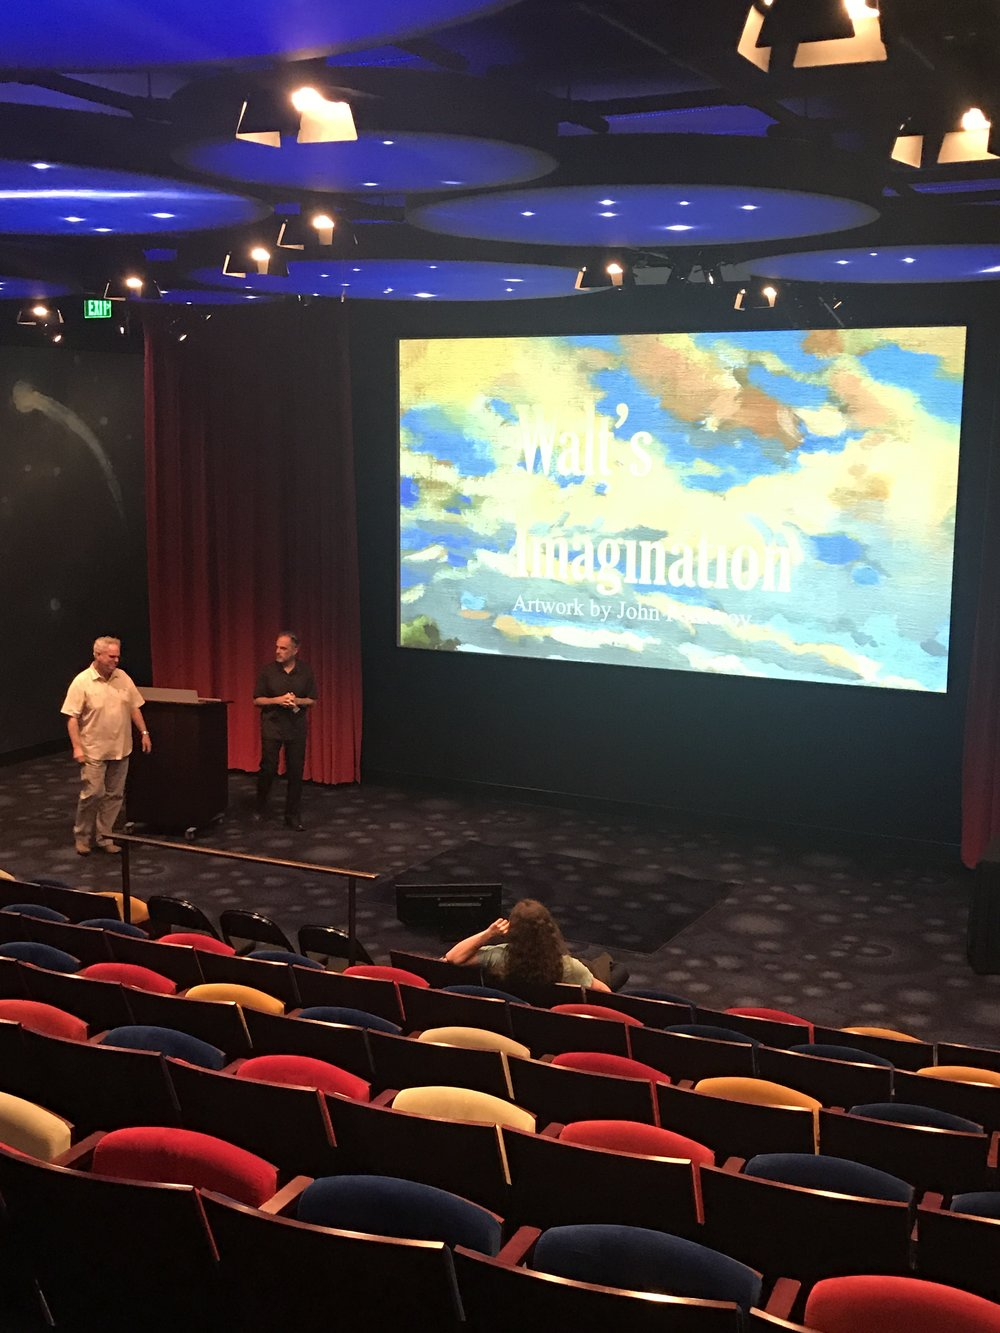 John's presentation at the Walt Disney Family Museum.